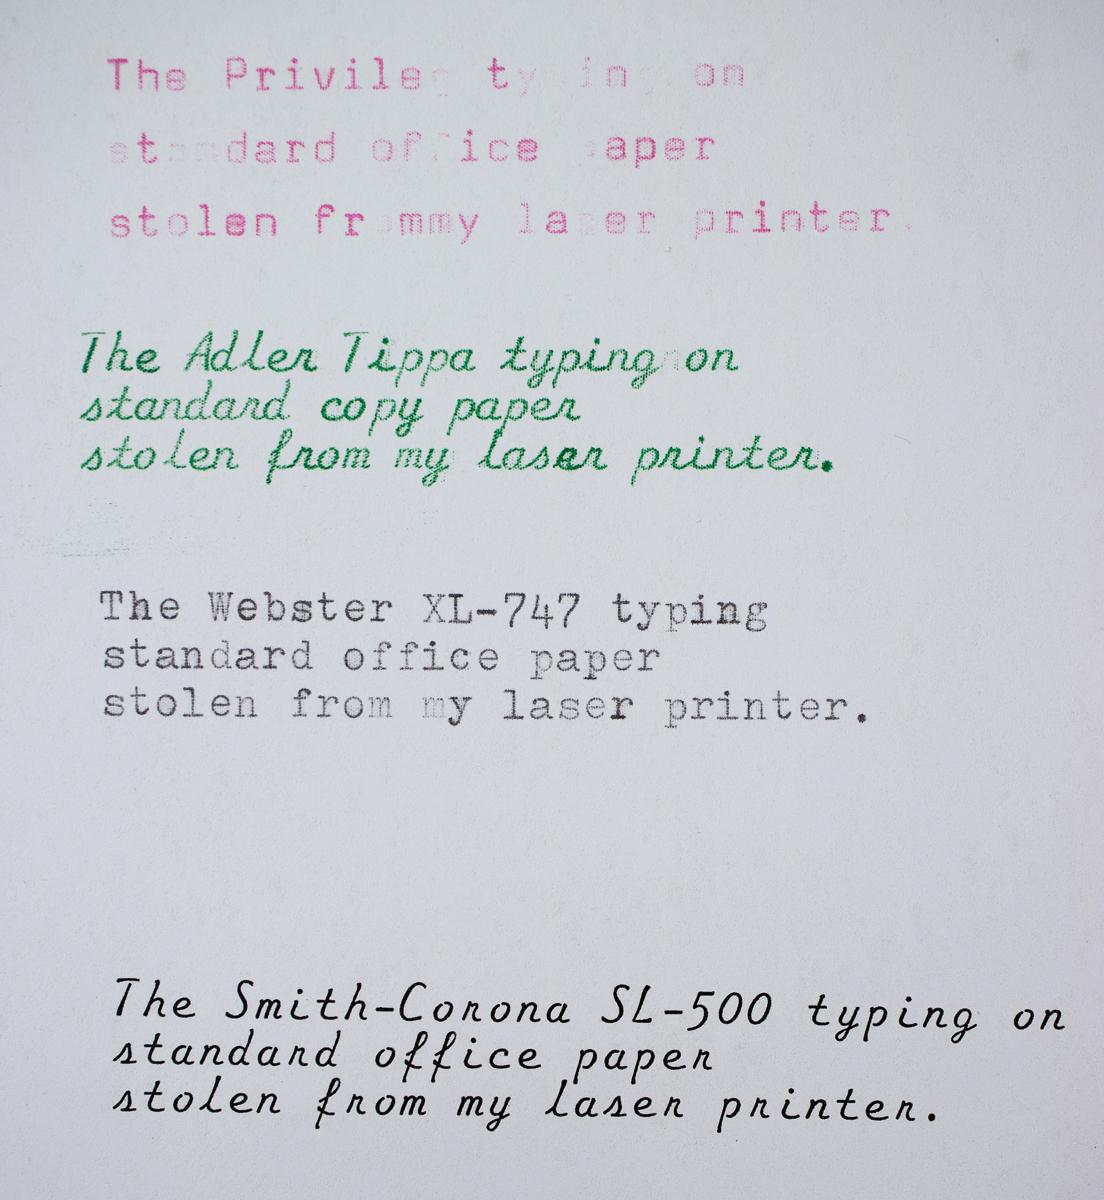 Life Typewriter Paper comparison on laser copy paper